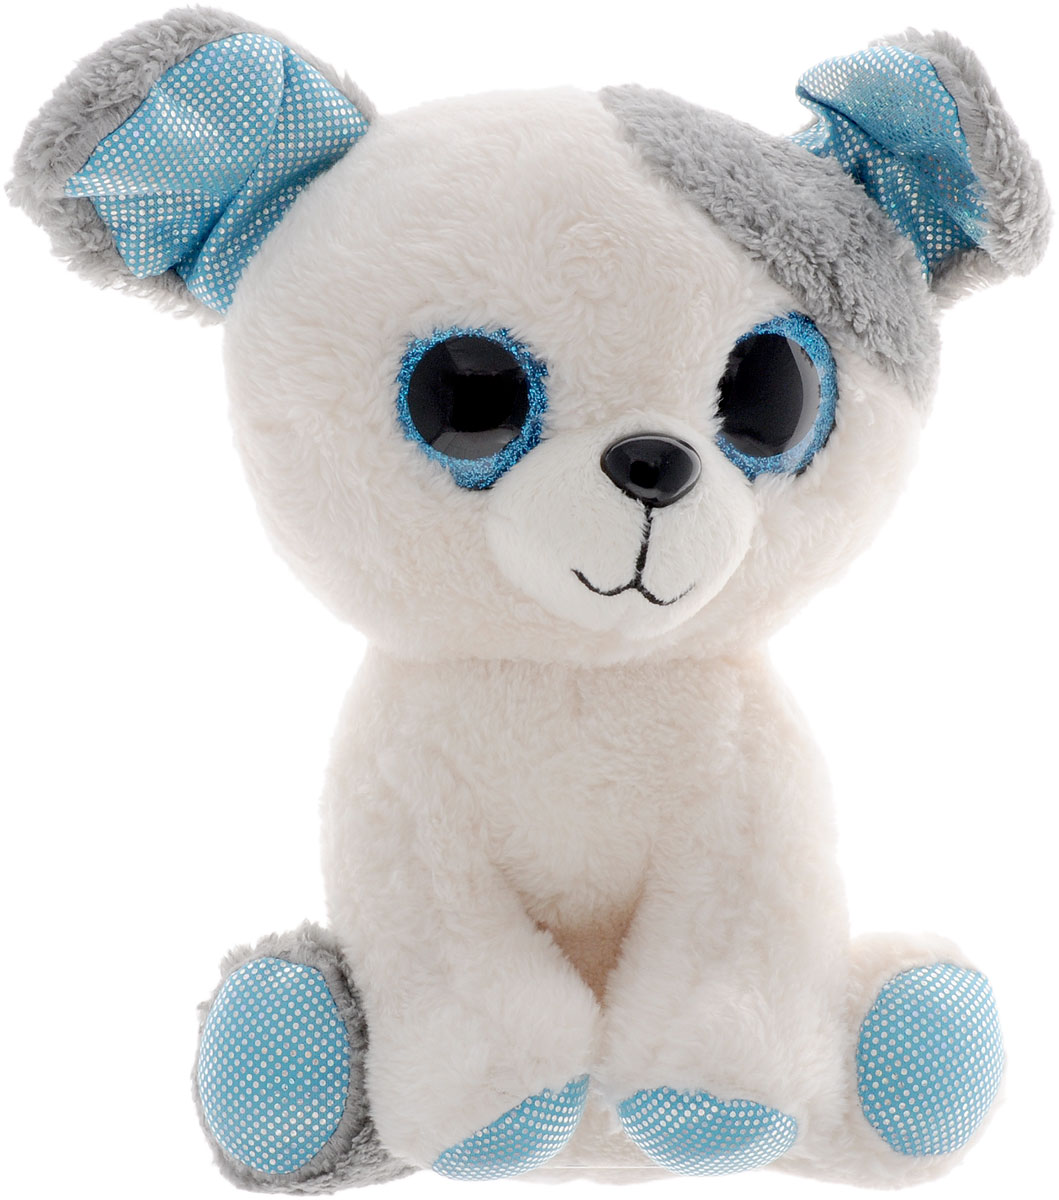 Fancy Мягкая игрушка Собачка Глазастик 22 см